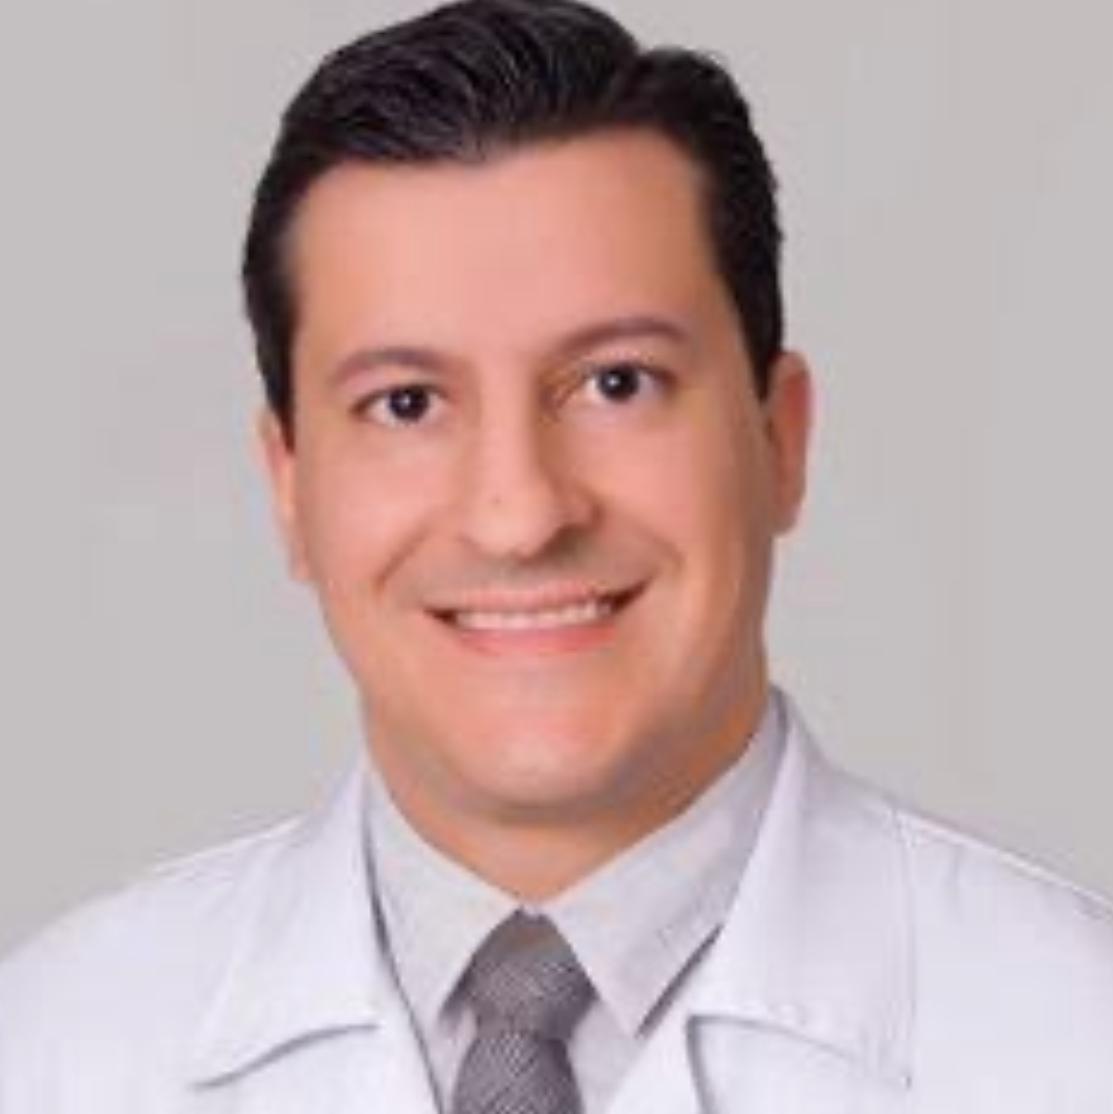 Fabio Sant'Anna de Moraes